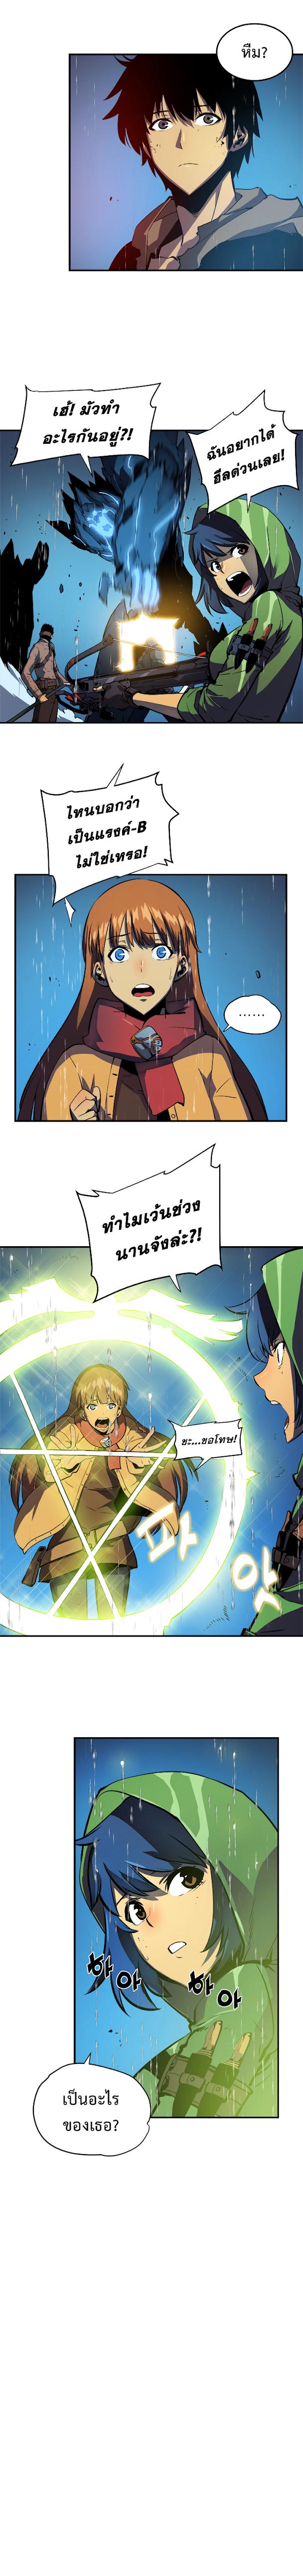 Solo Leveling ตอนที่ 17 TH แปลไทย